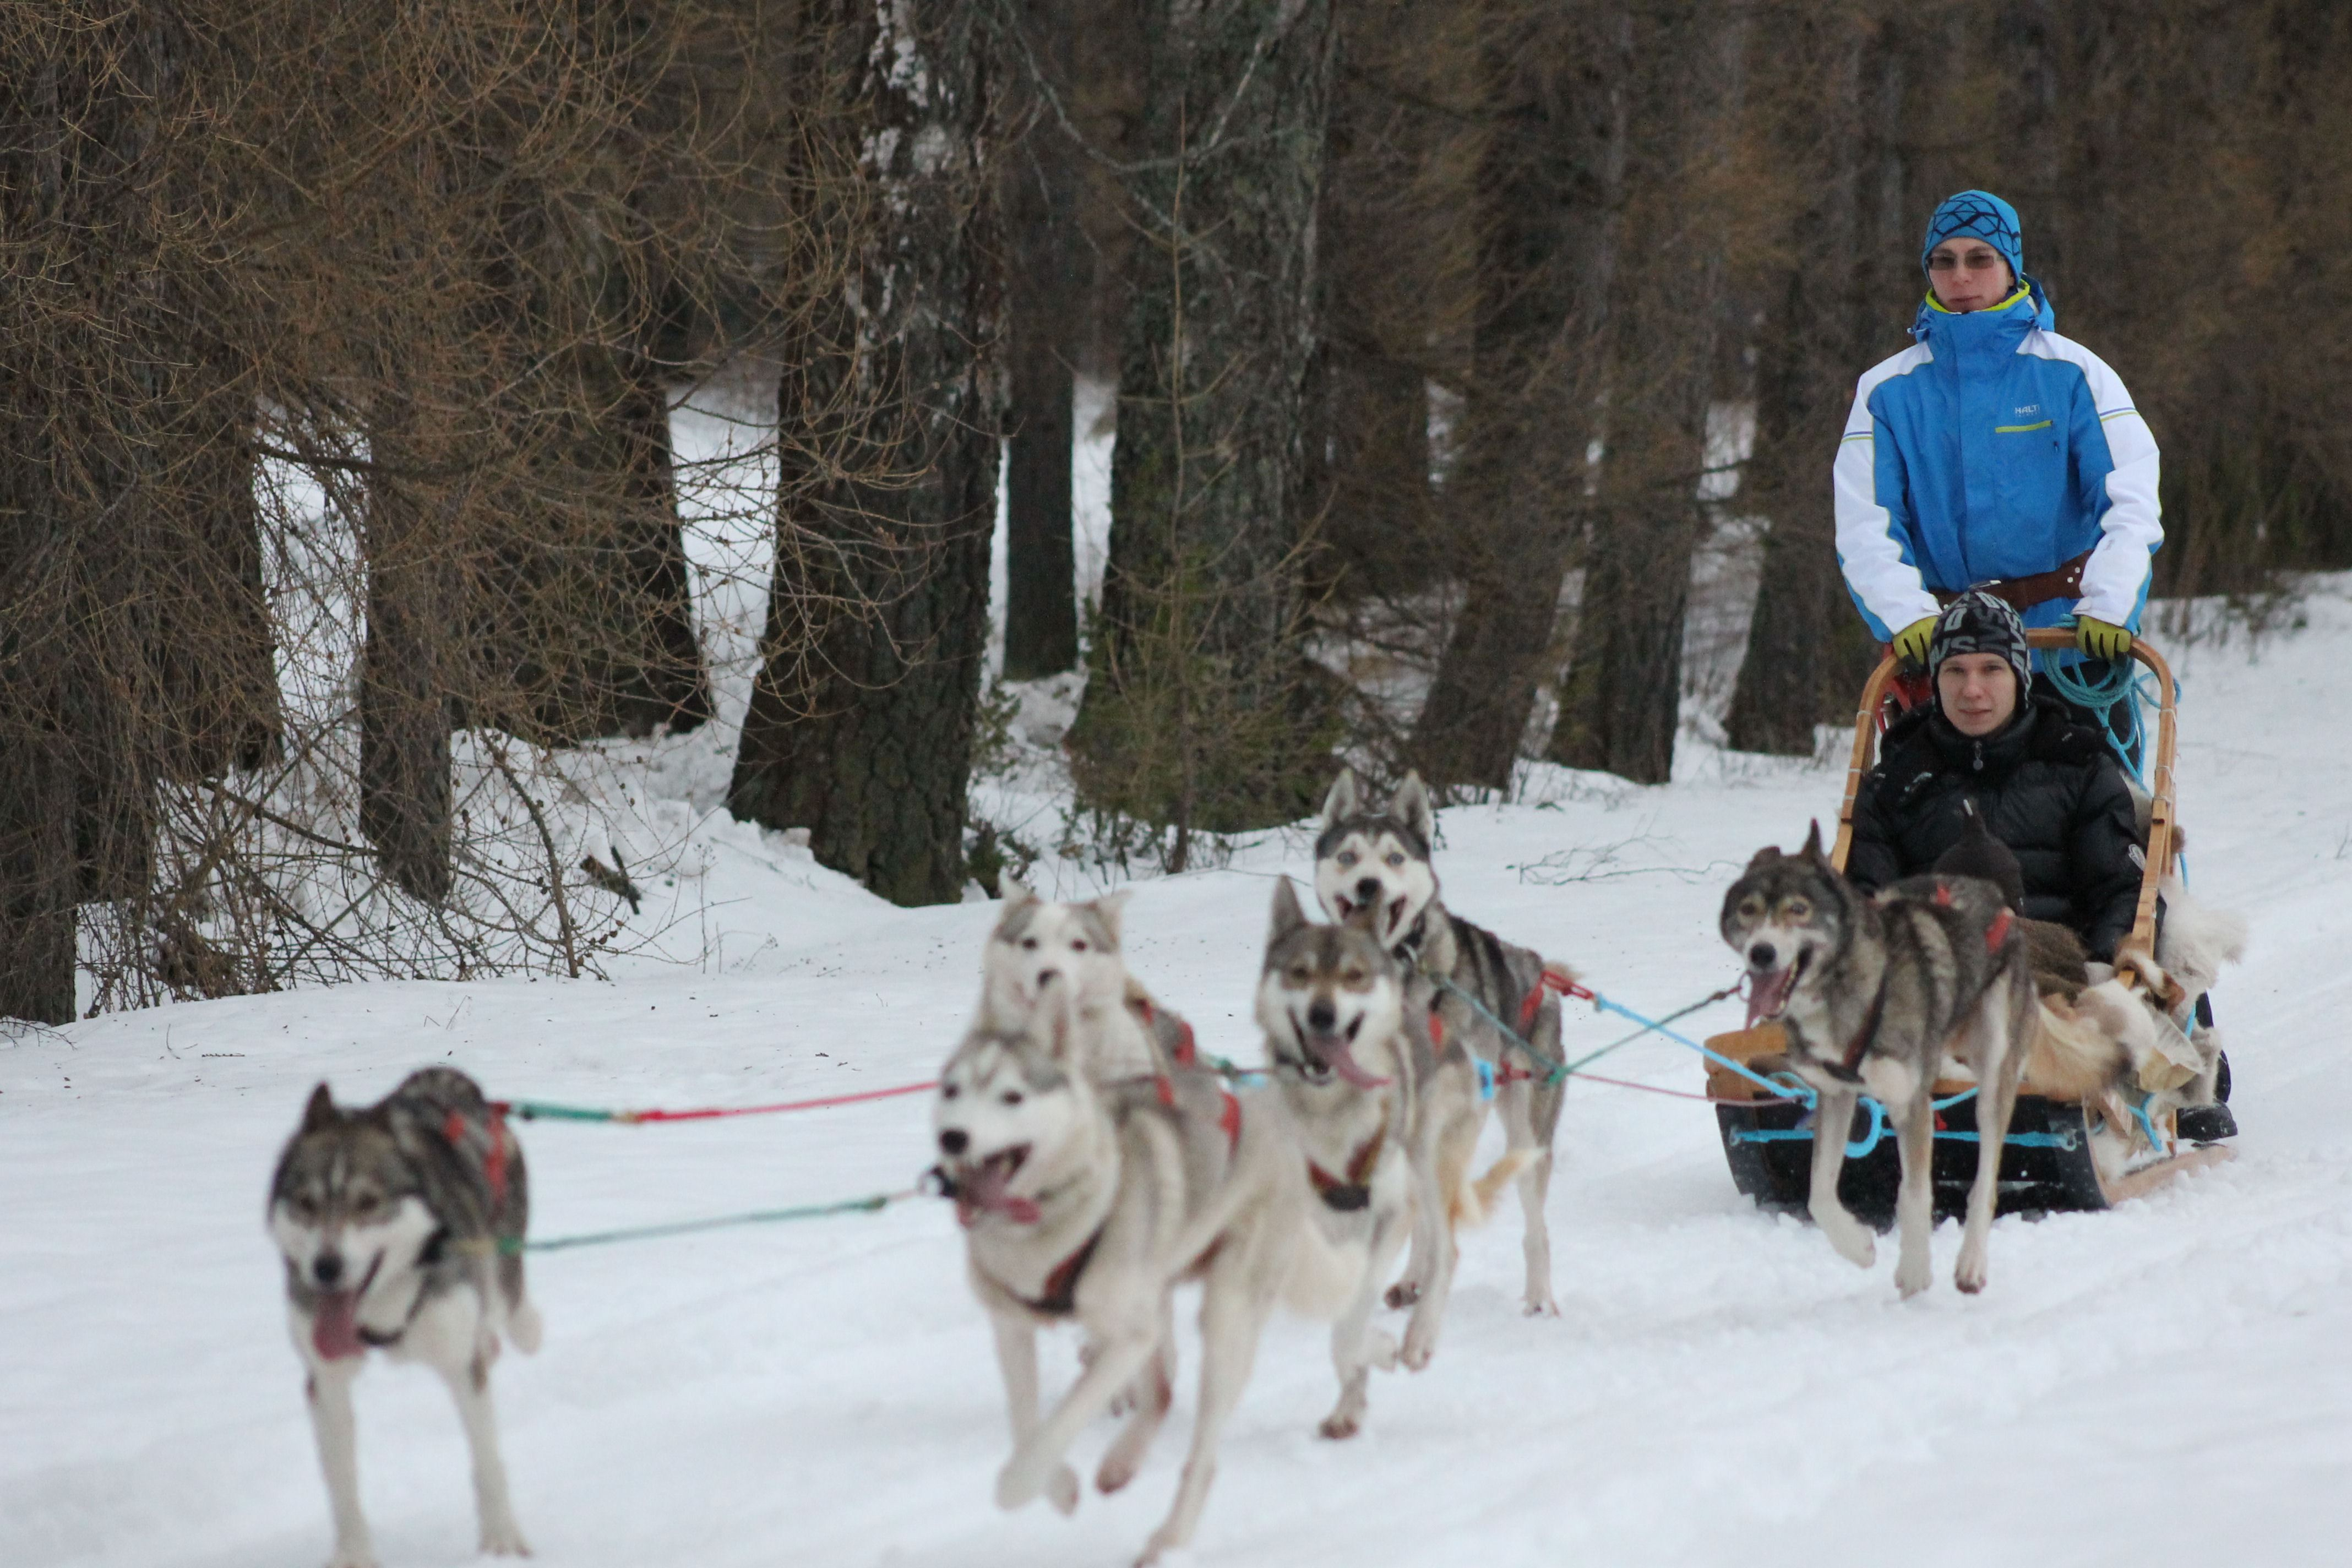 Husky safari vacation in Kullasmarina, 2 days